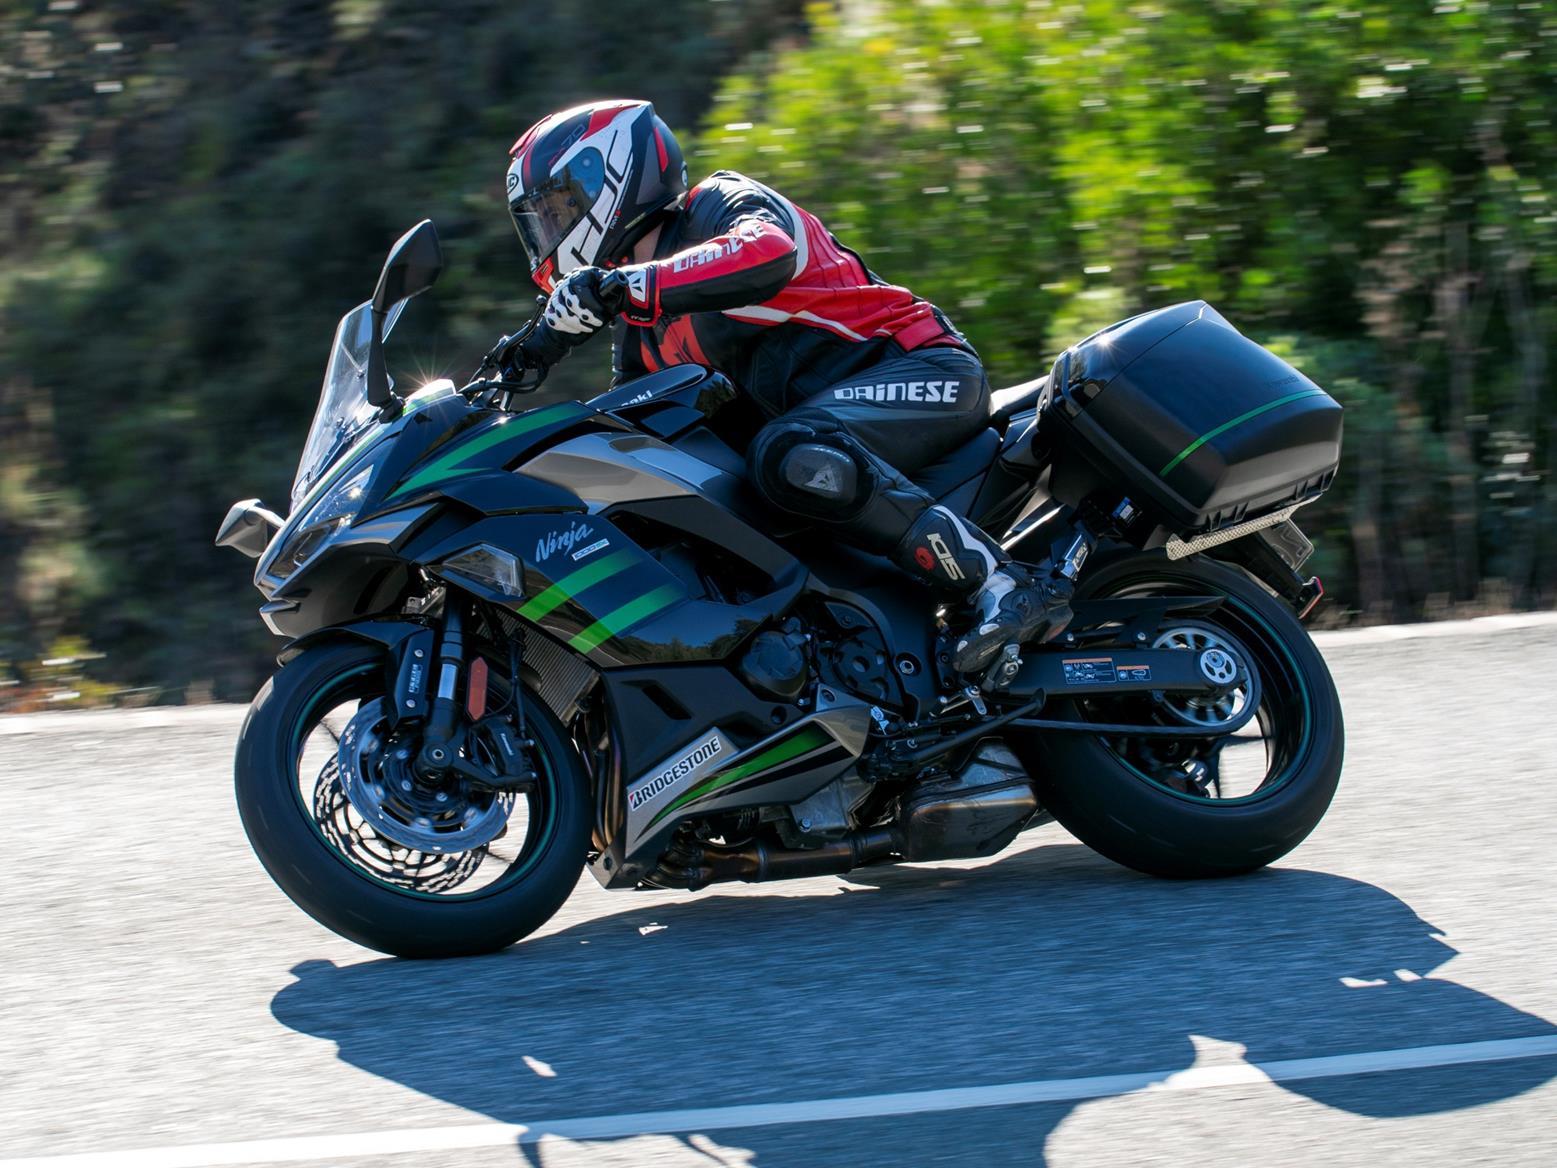 Kawasaki Ninja 1000SX side view